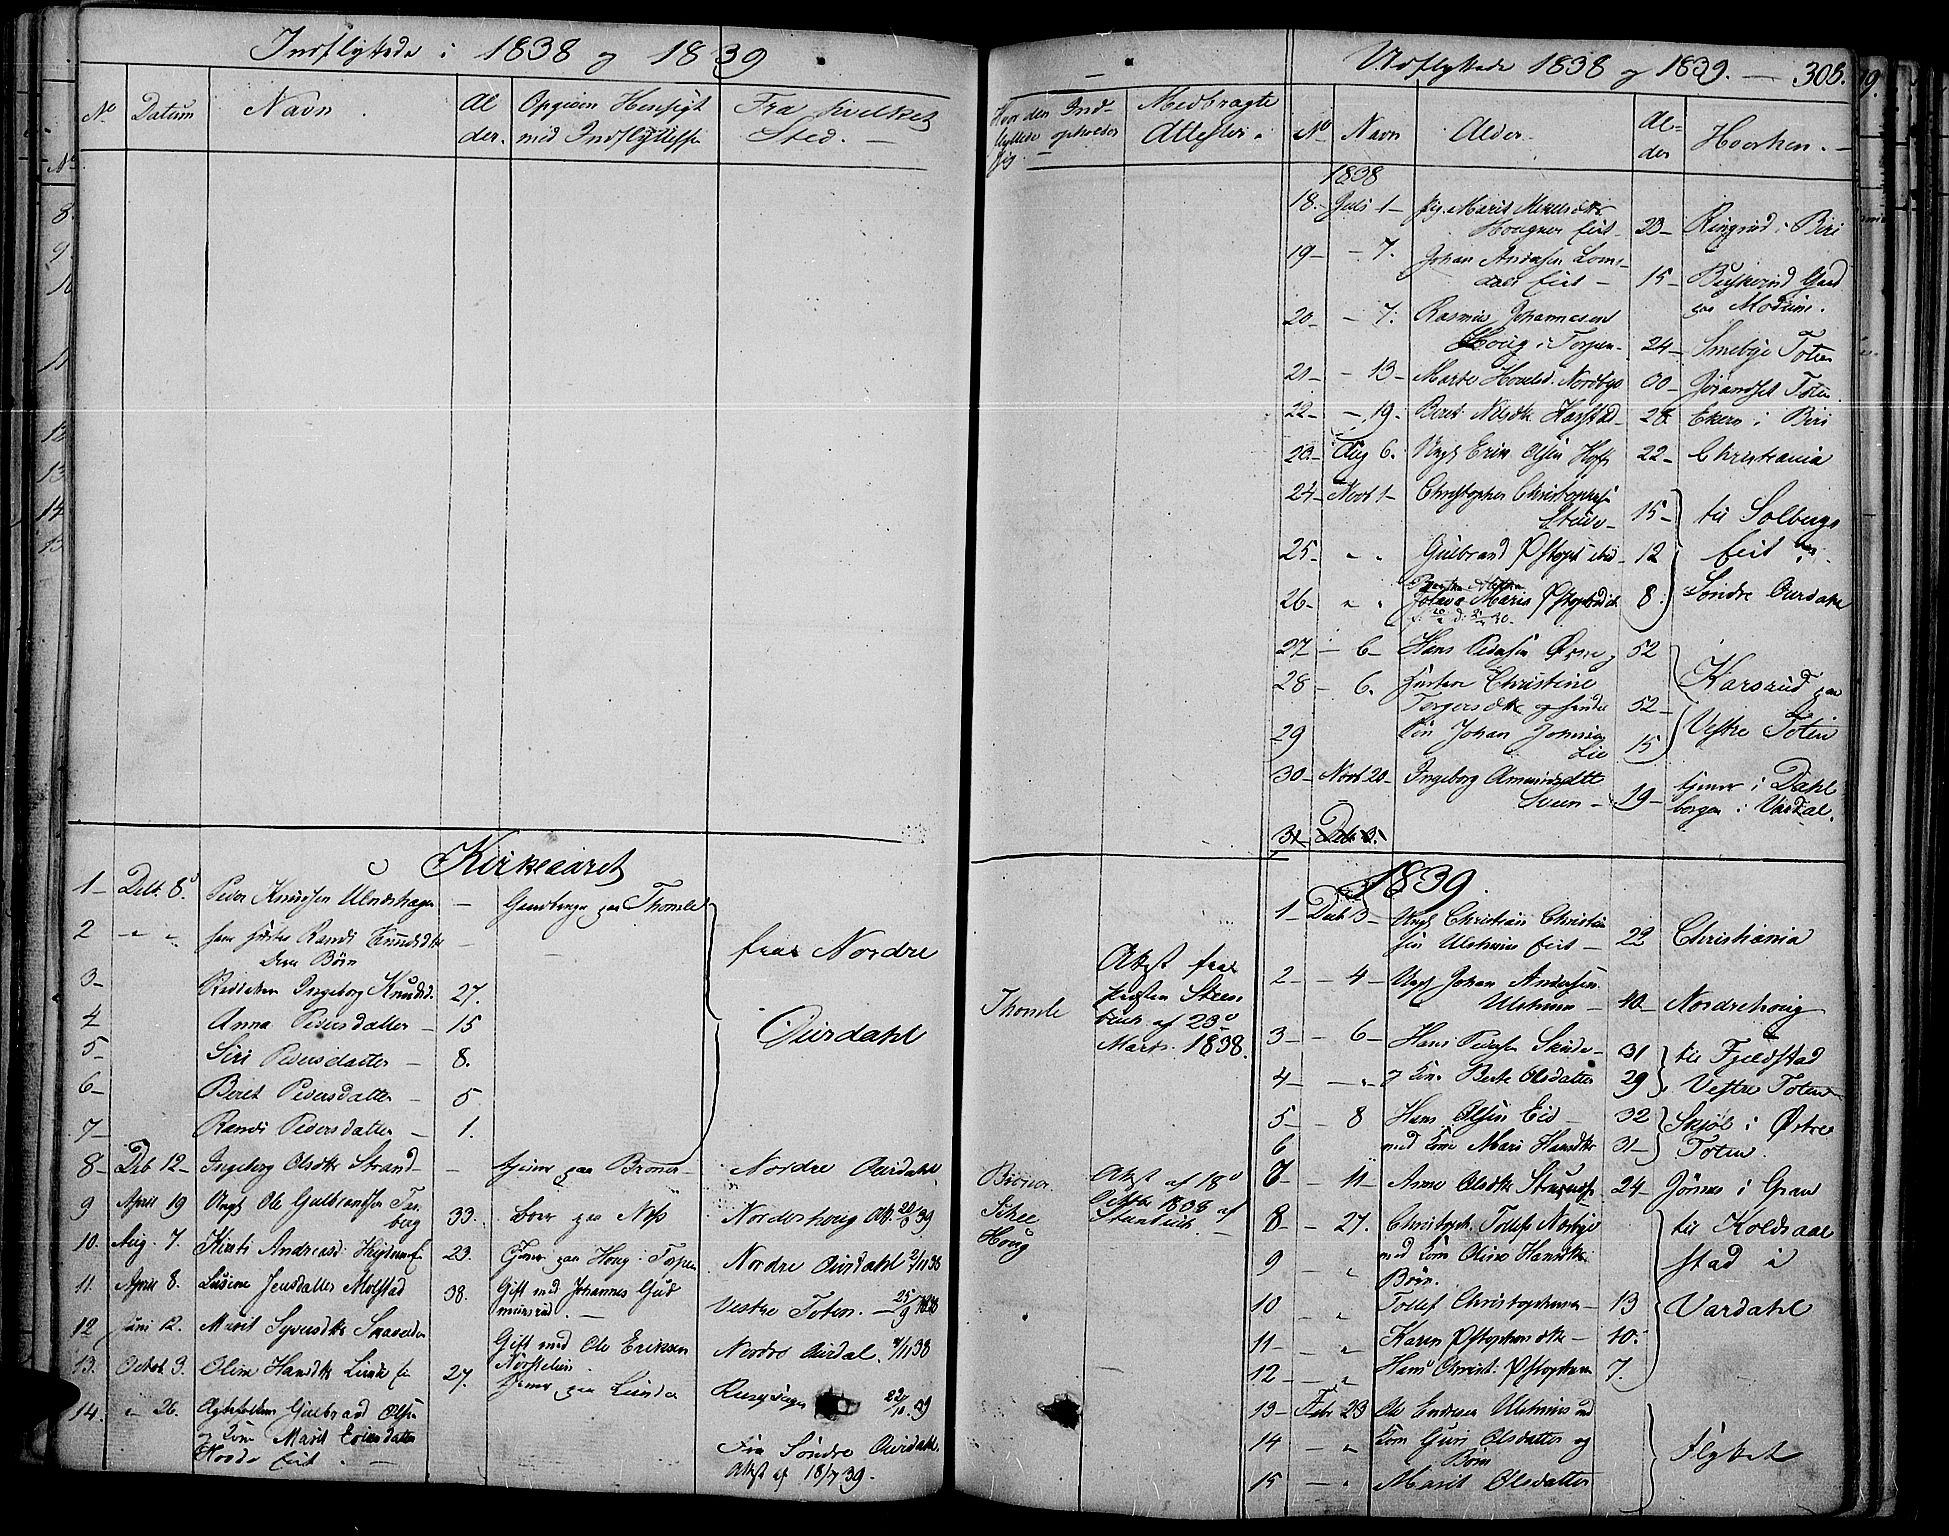 SAH, Land prestekontor, Ministerialbok nr. 8, 1830-1846, s. 308